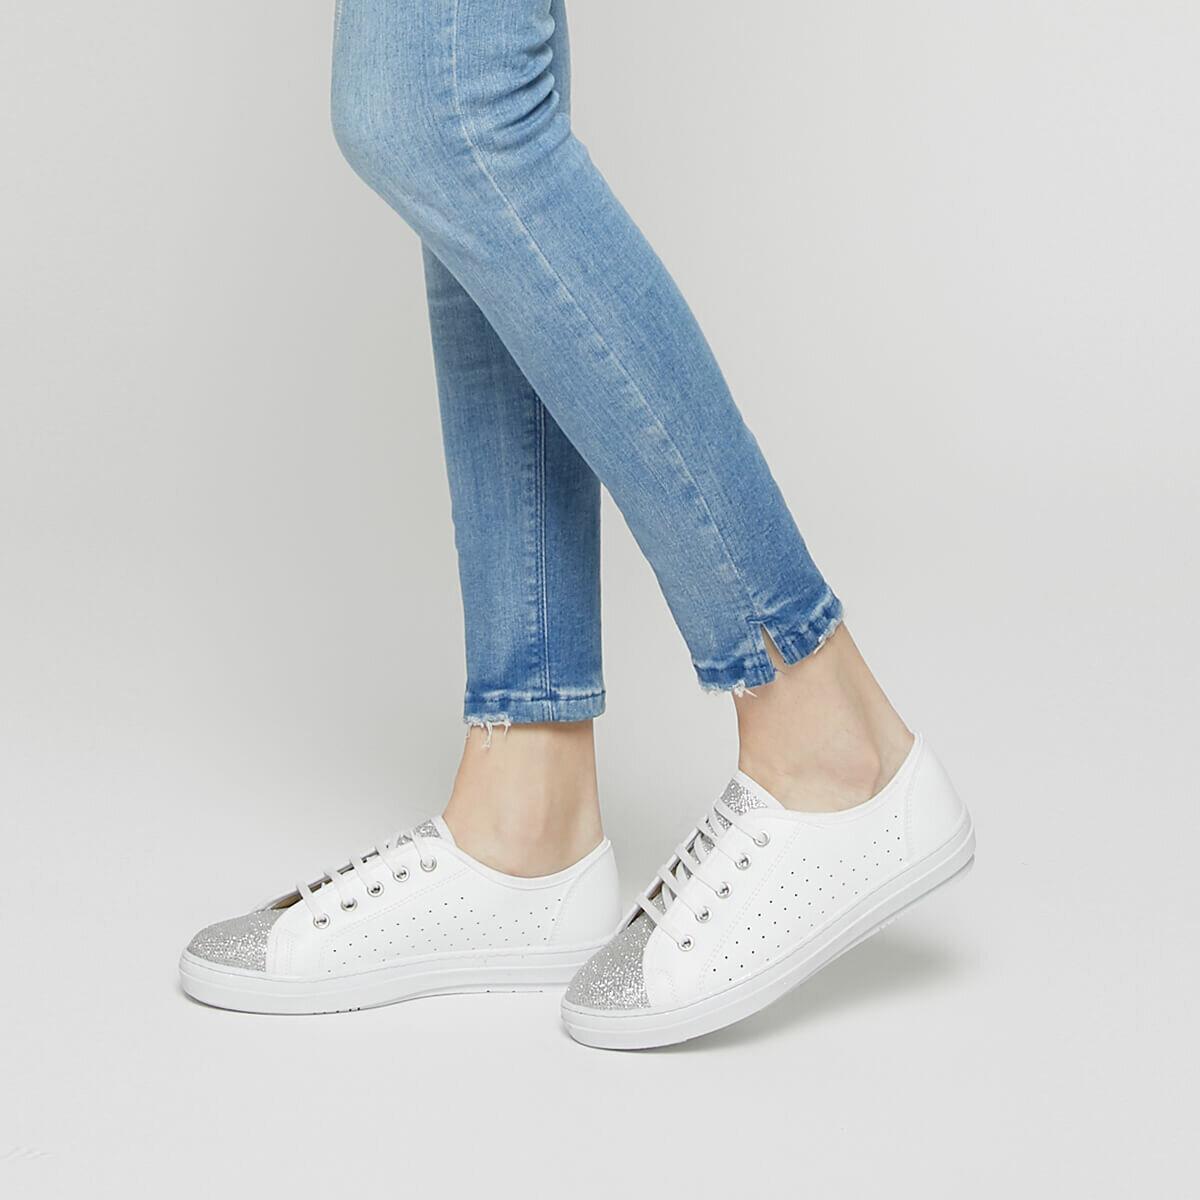 FLO CS19052 White Women 'S Sneaker Shoes Art Bella